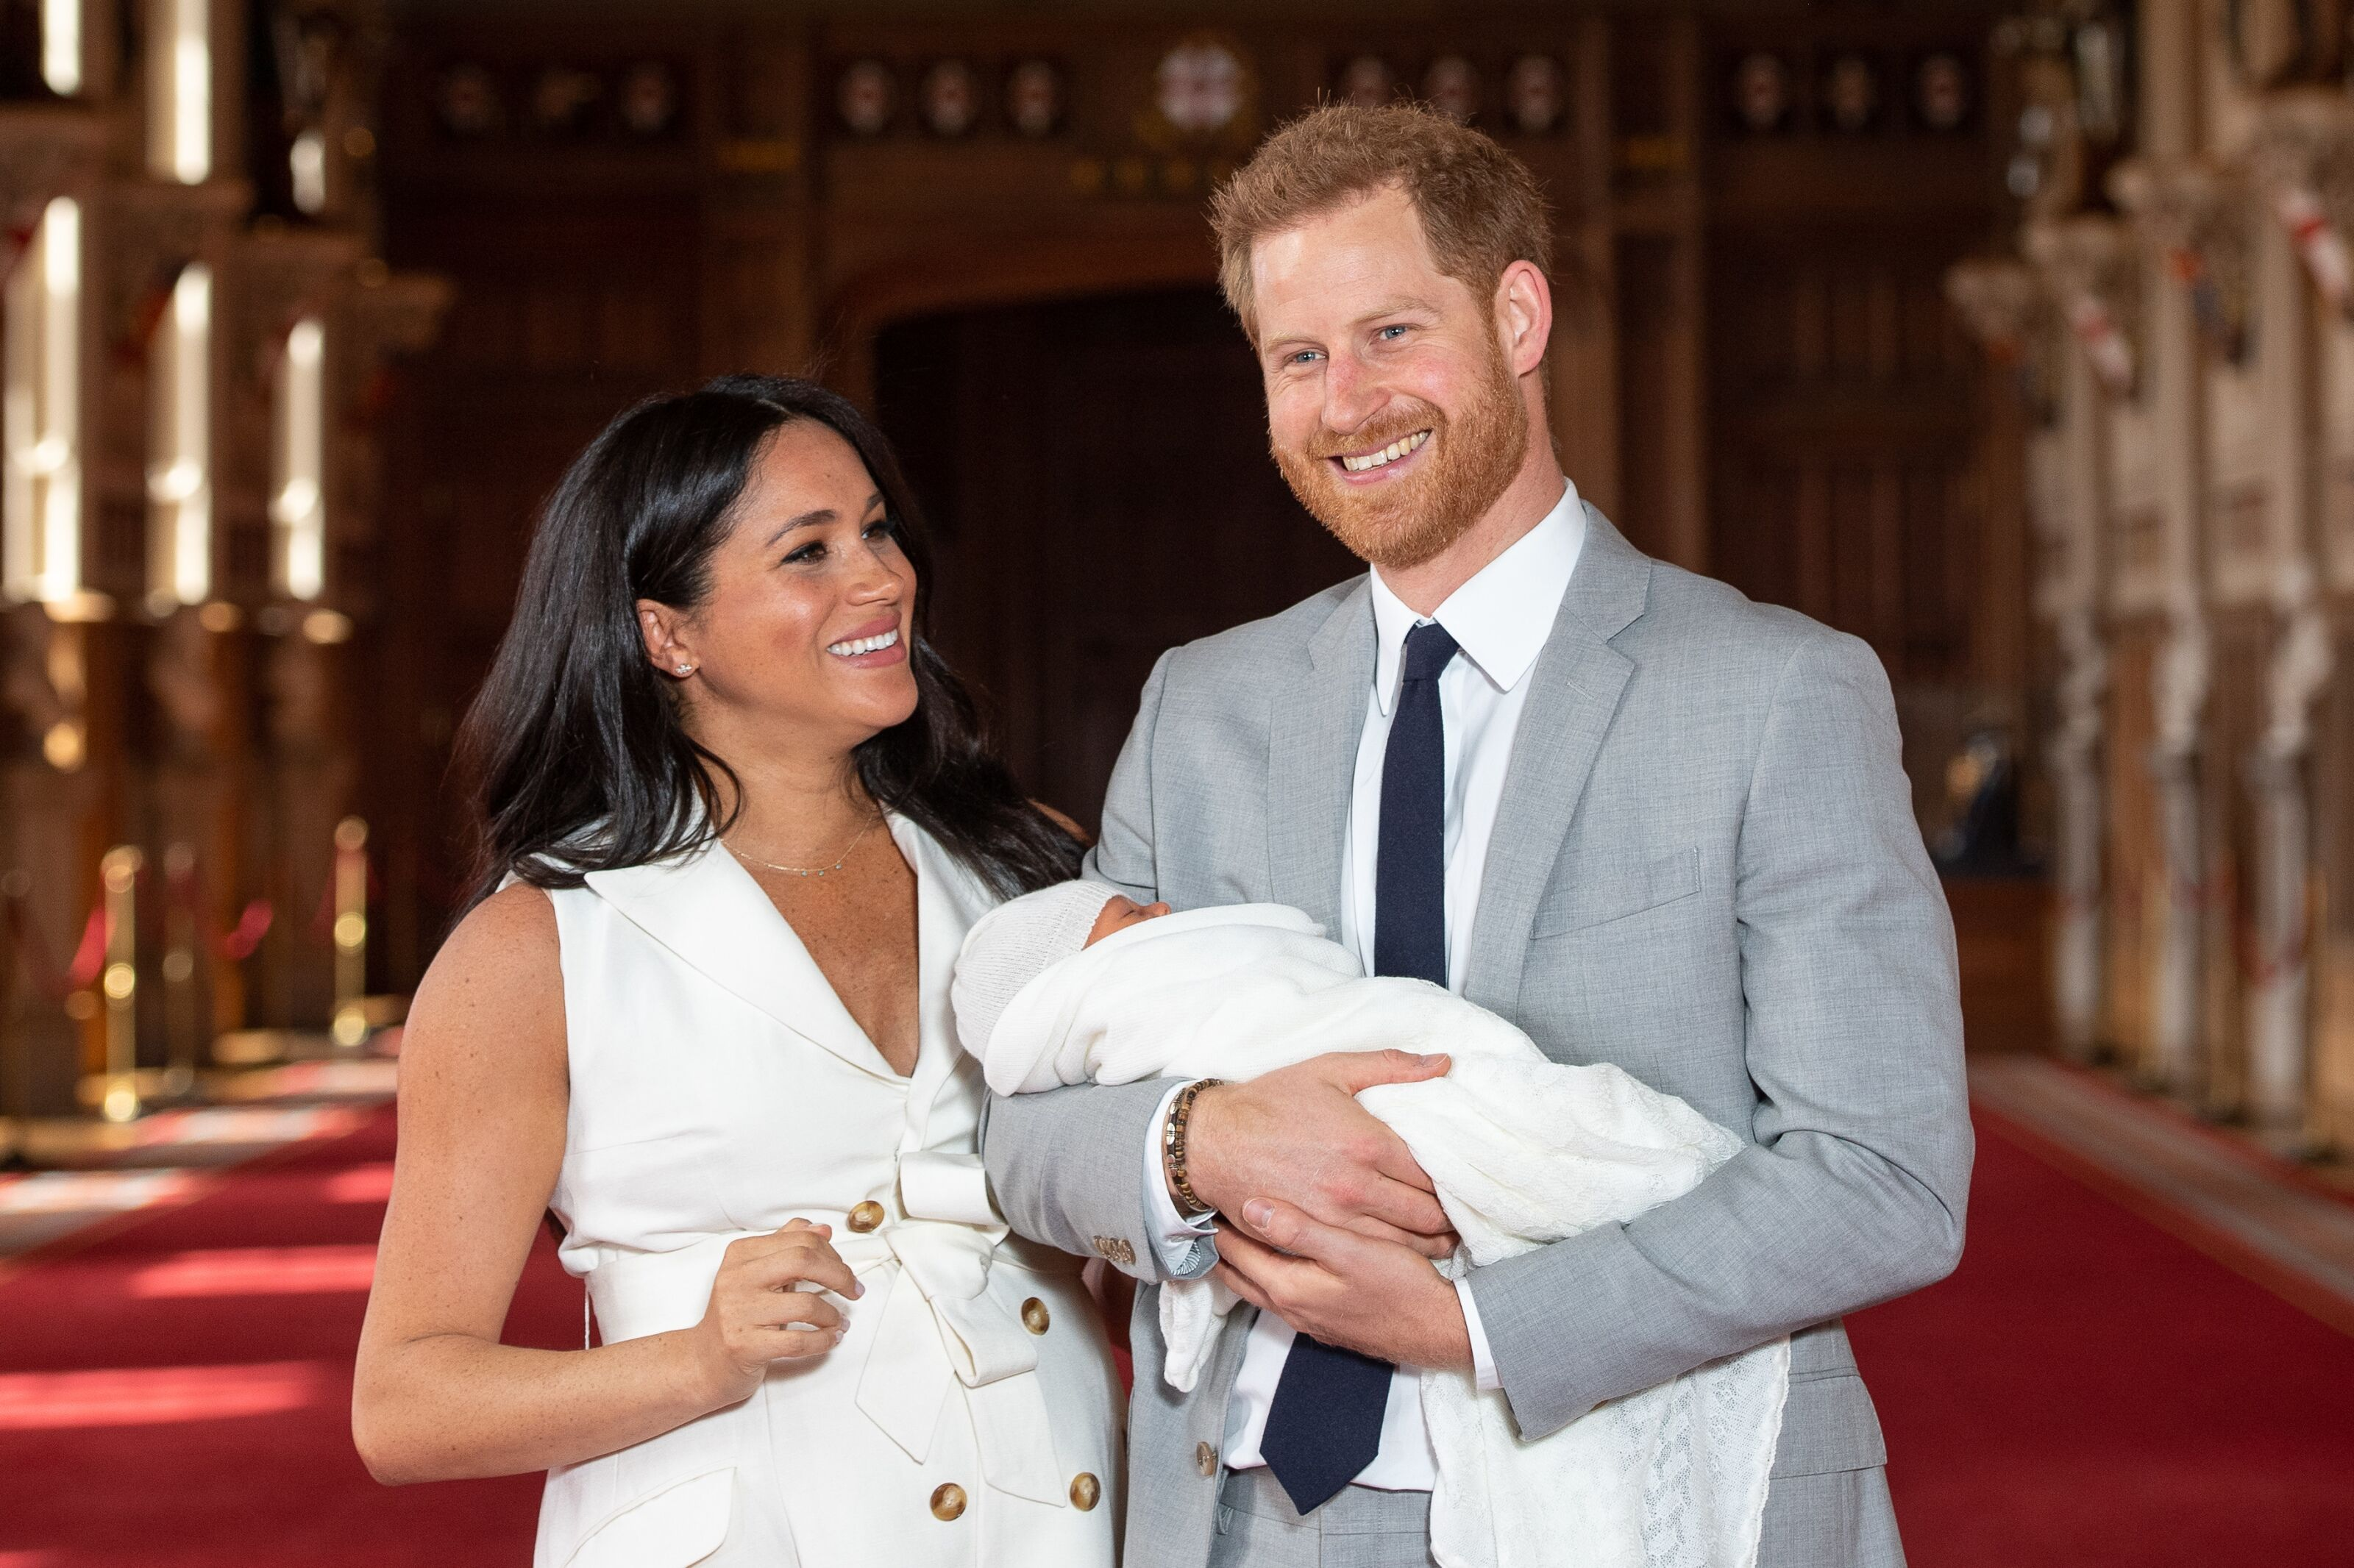 Meghan Markle spends 3 million taxpayers dollars on mansion: 'Princess or Kardashian?'